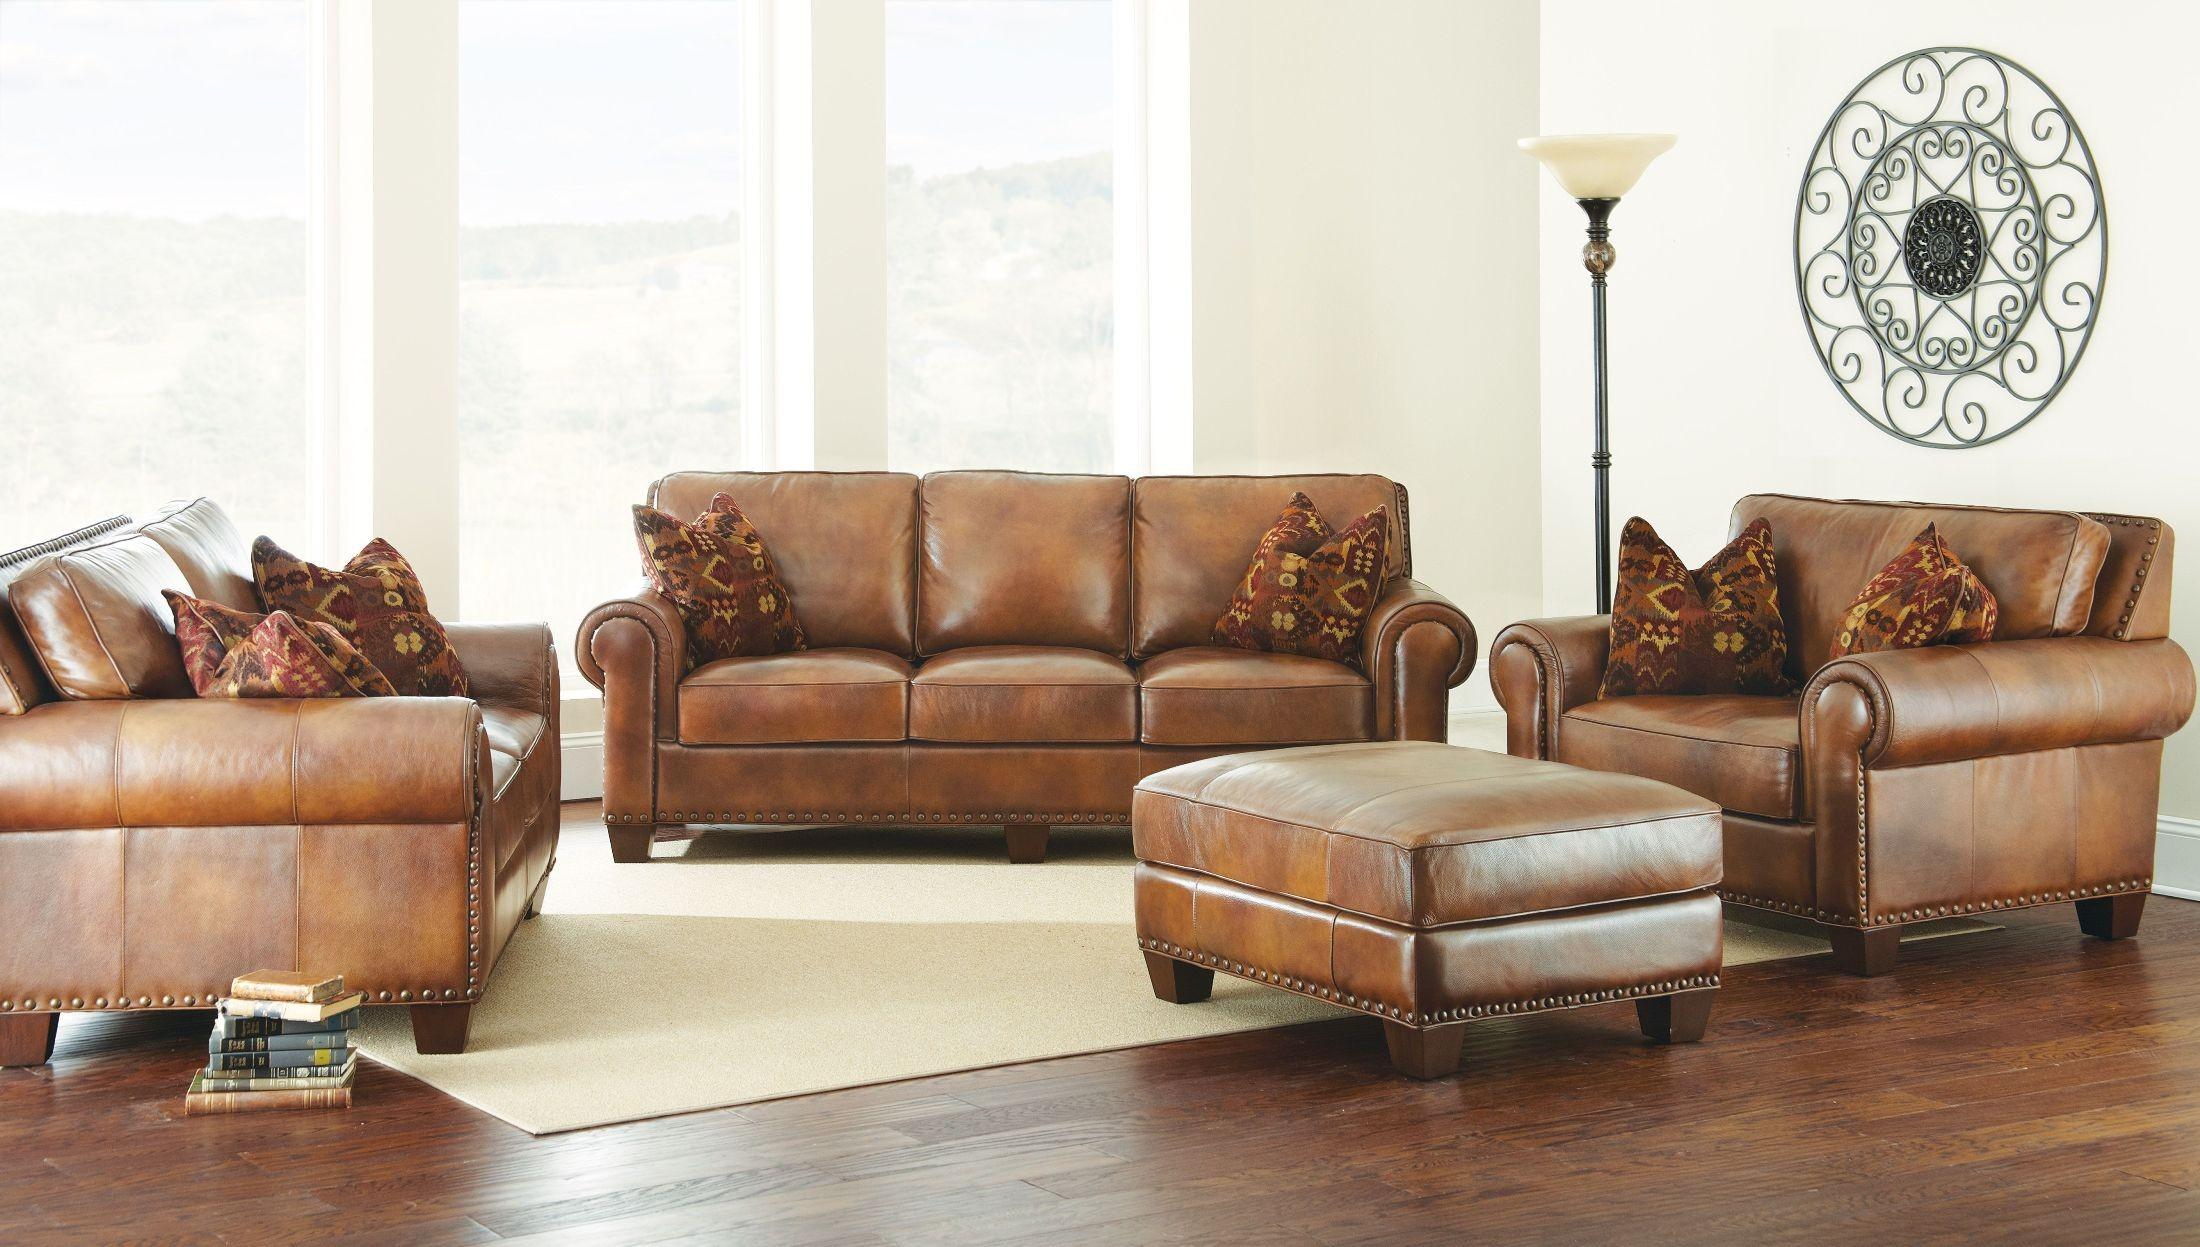 Silverado Caramel Brown Living Room Set from